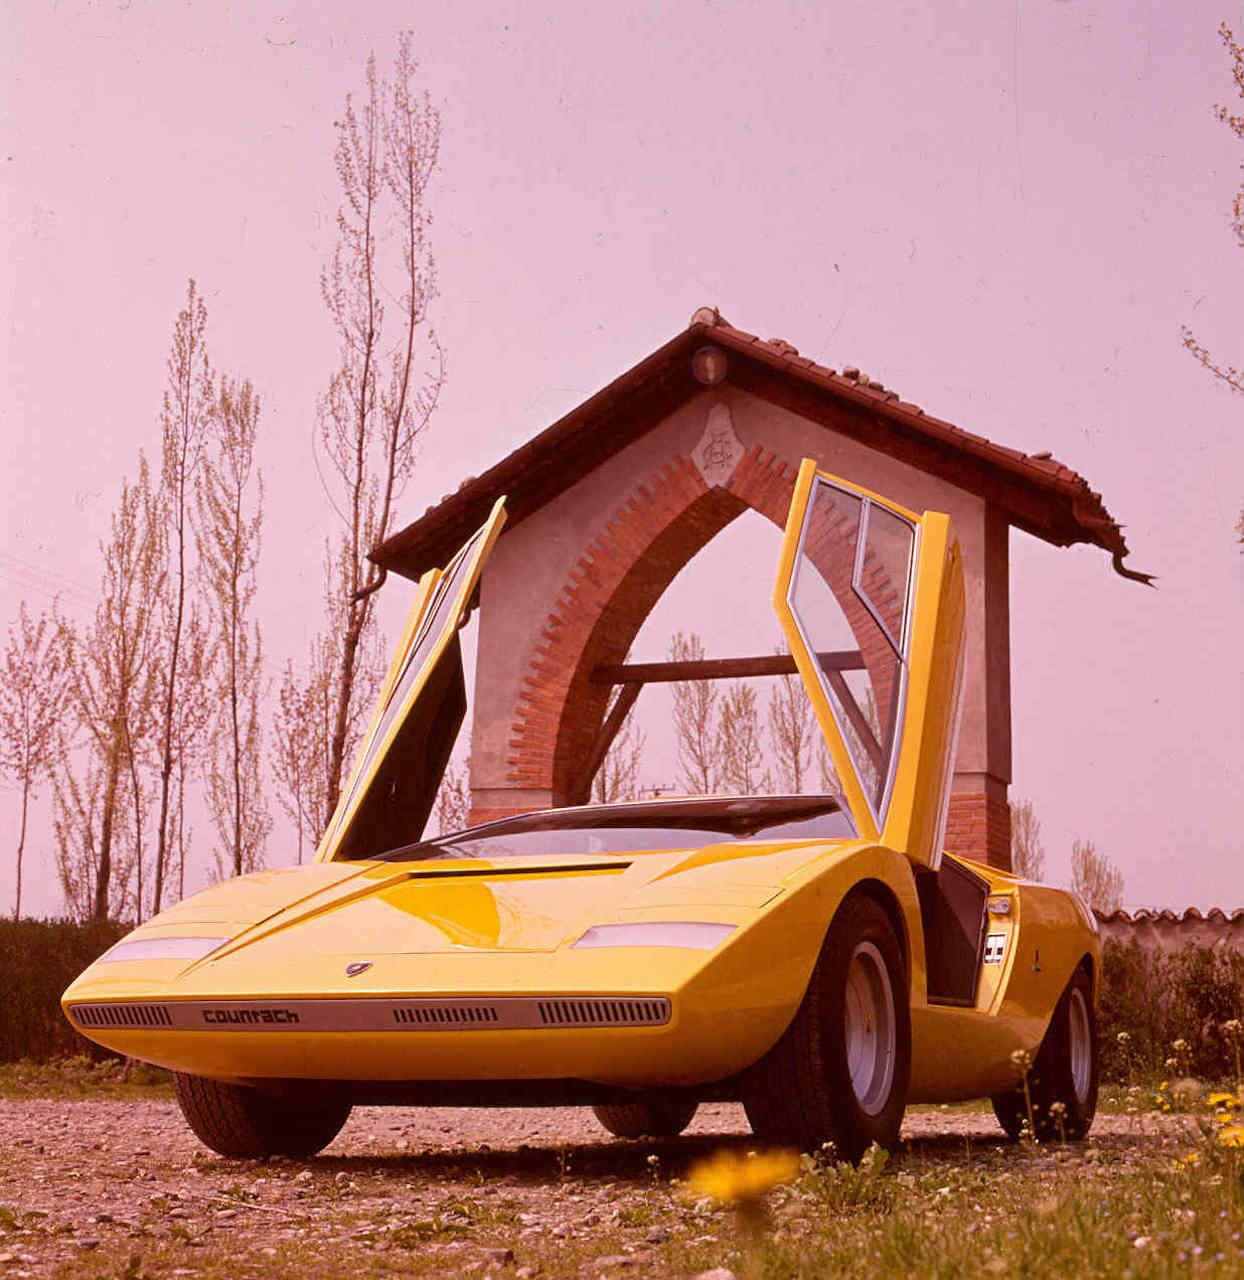 The iconic Lamborghini Countach LP 500 turns 50